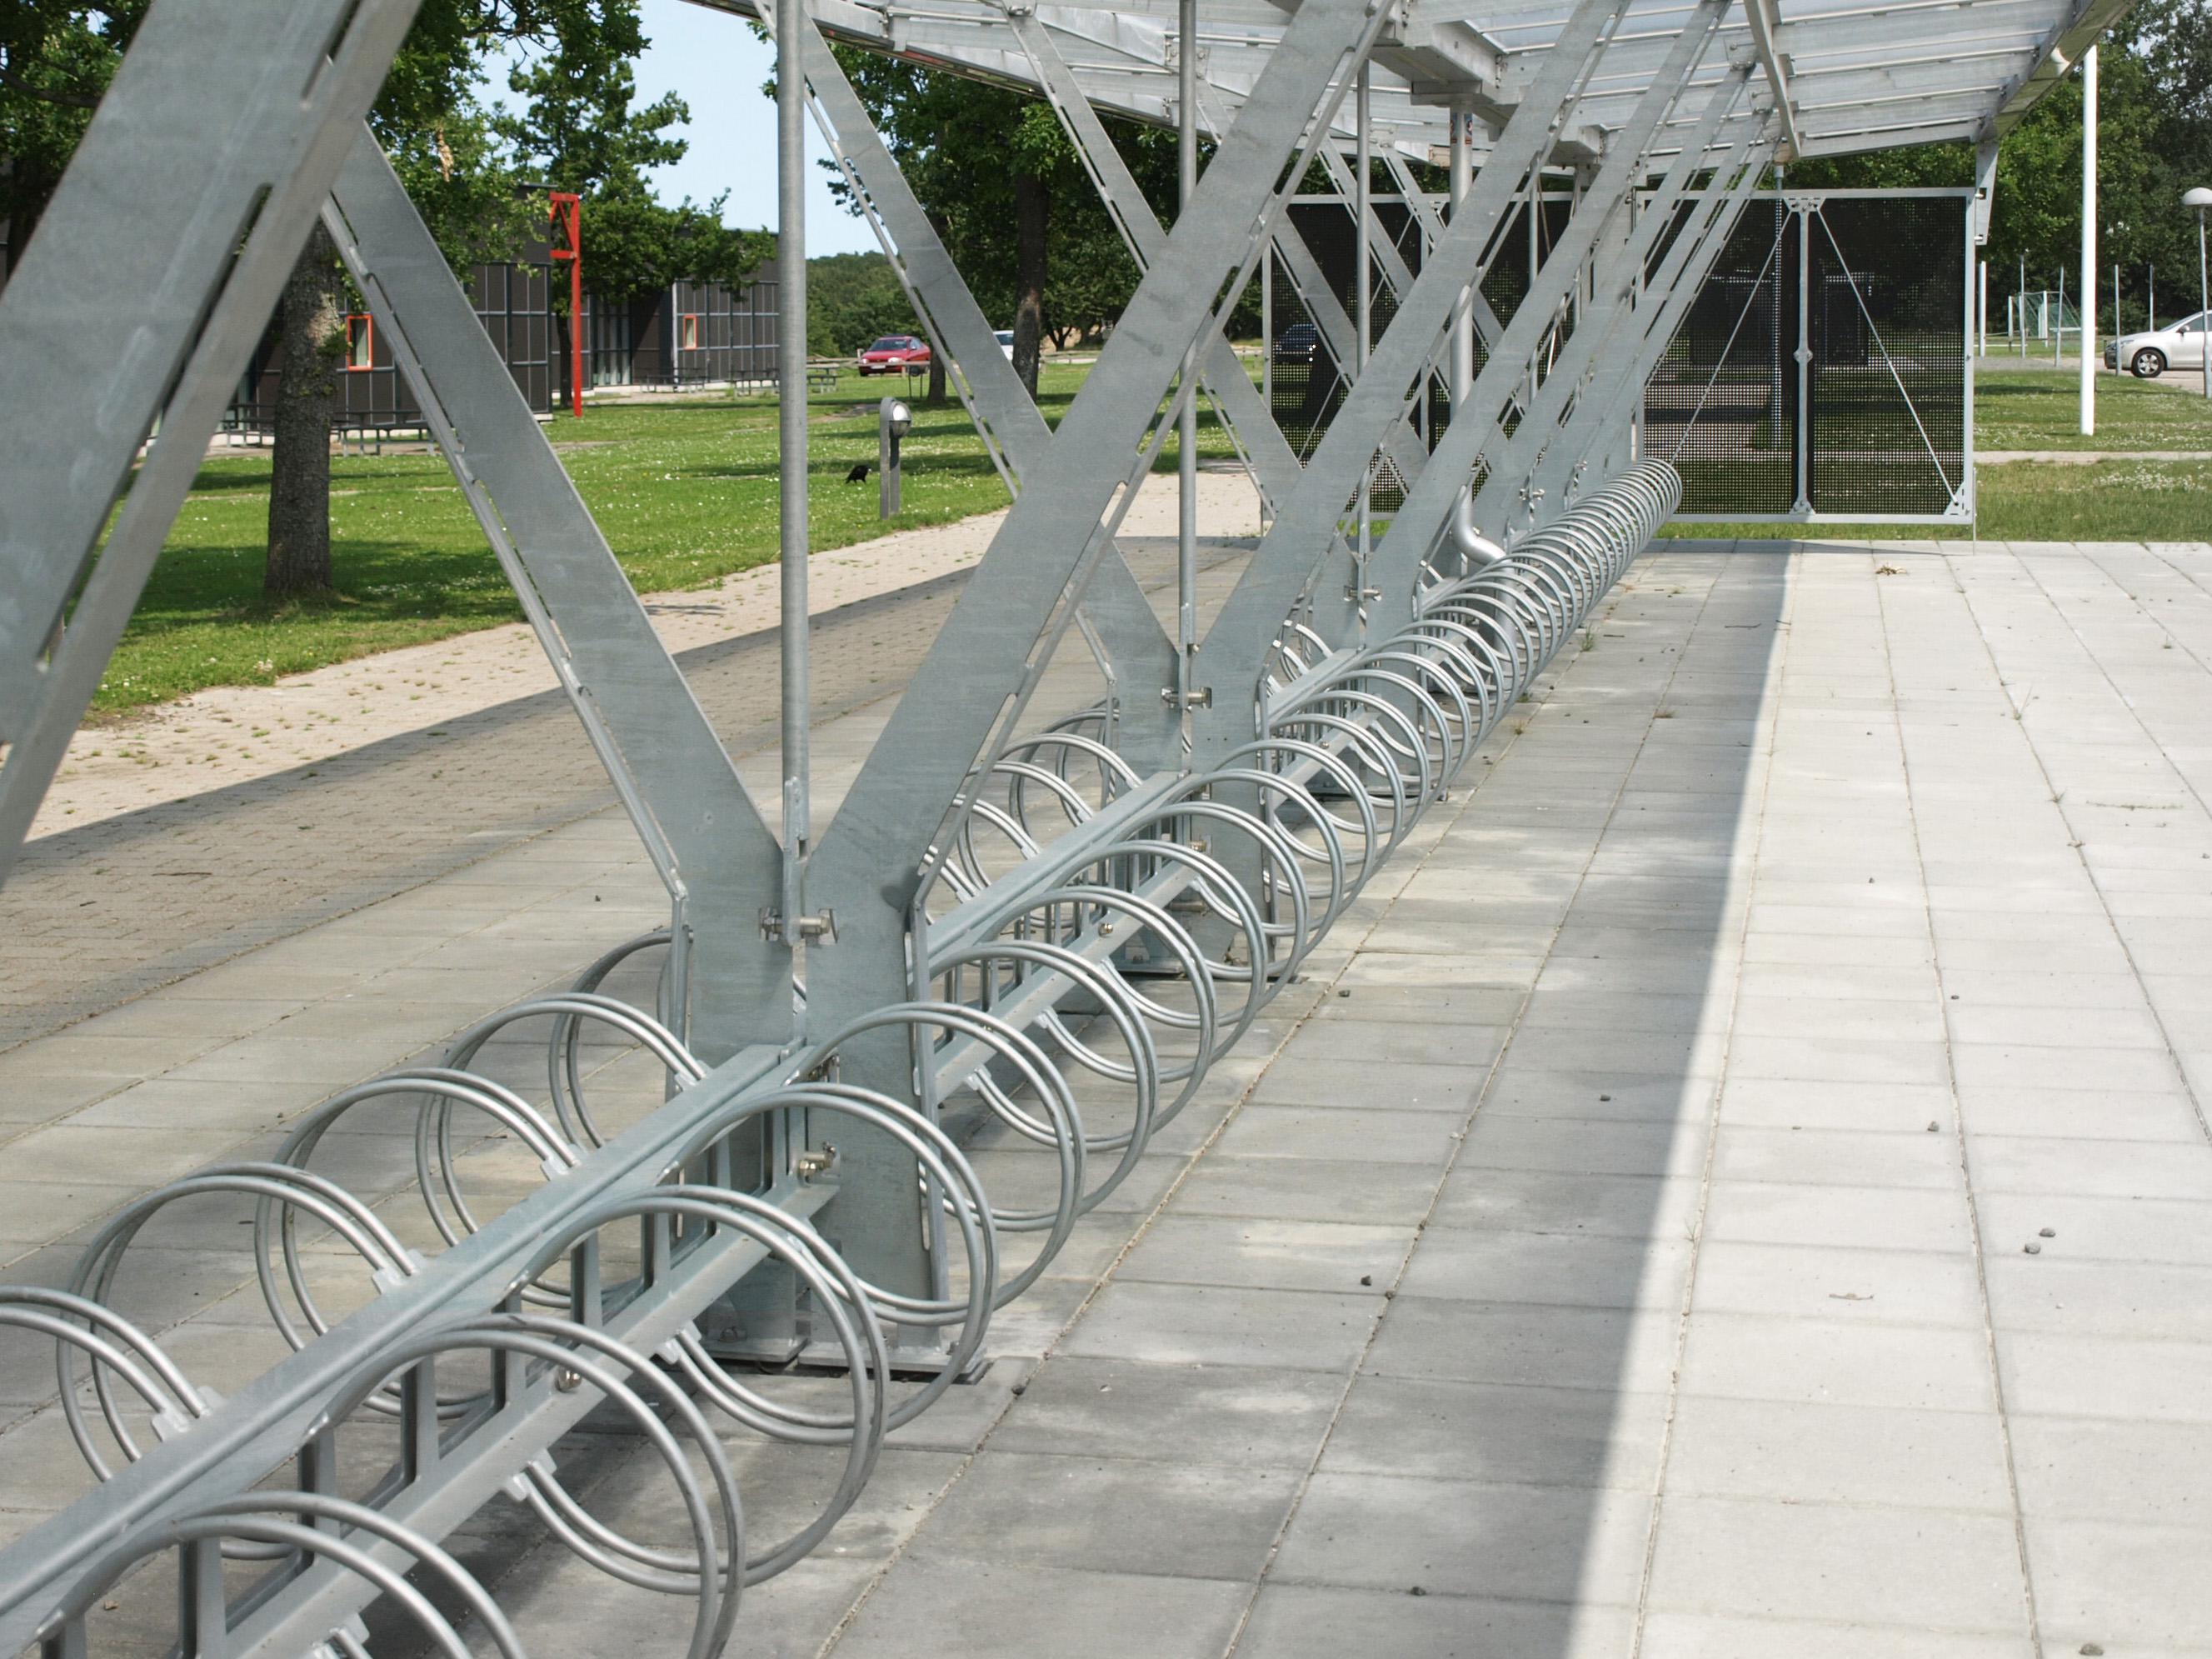 Cykeloverdækning, cykelstativer, Kolding Gymnasium, model 17. belysning